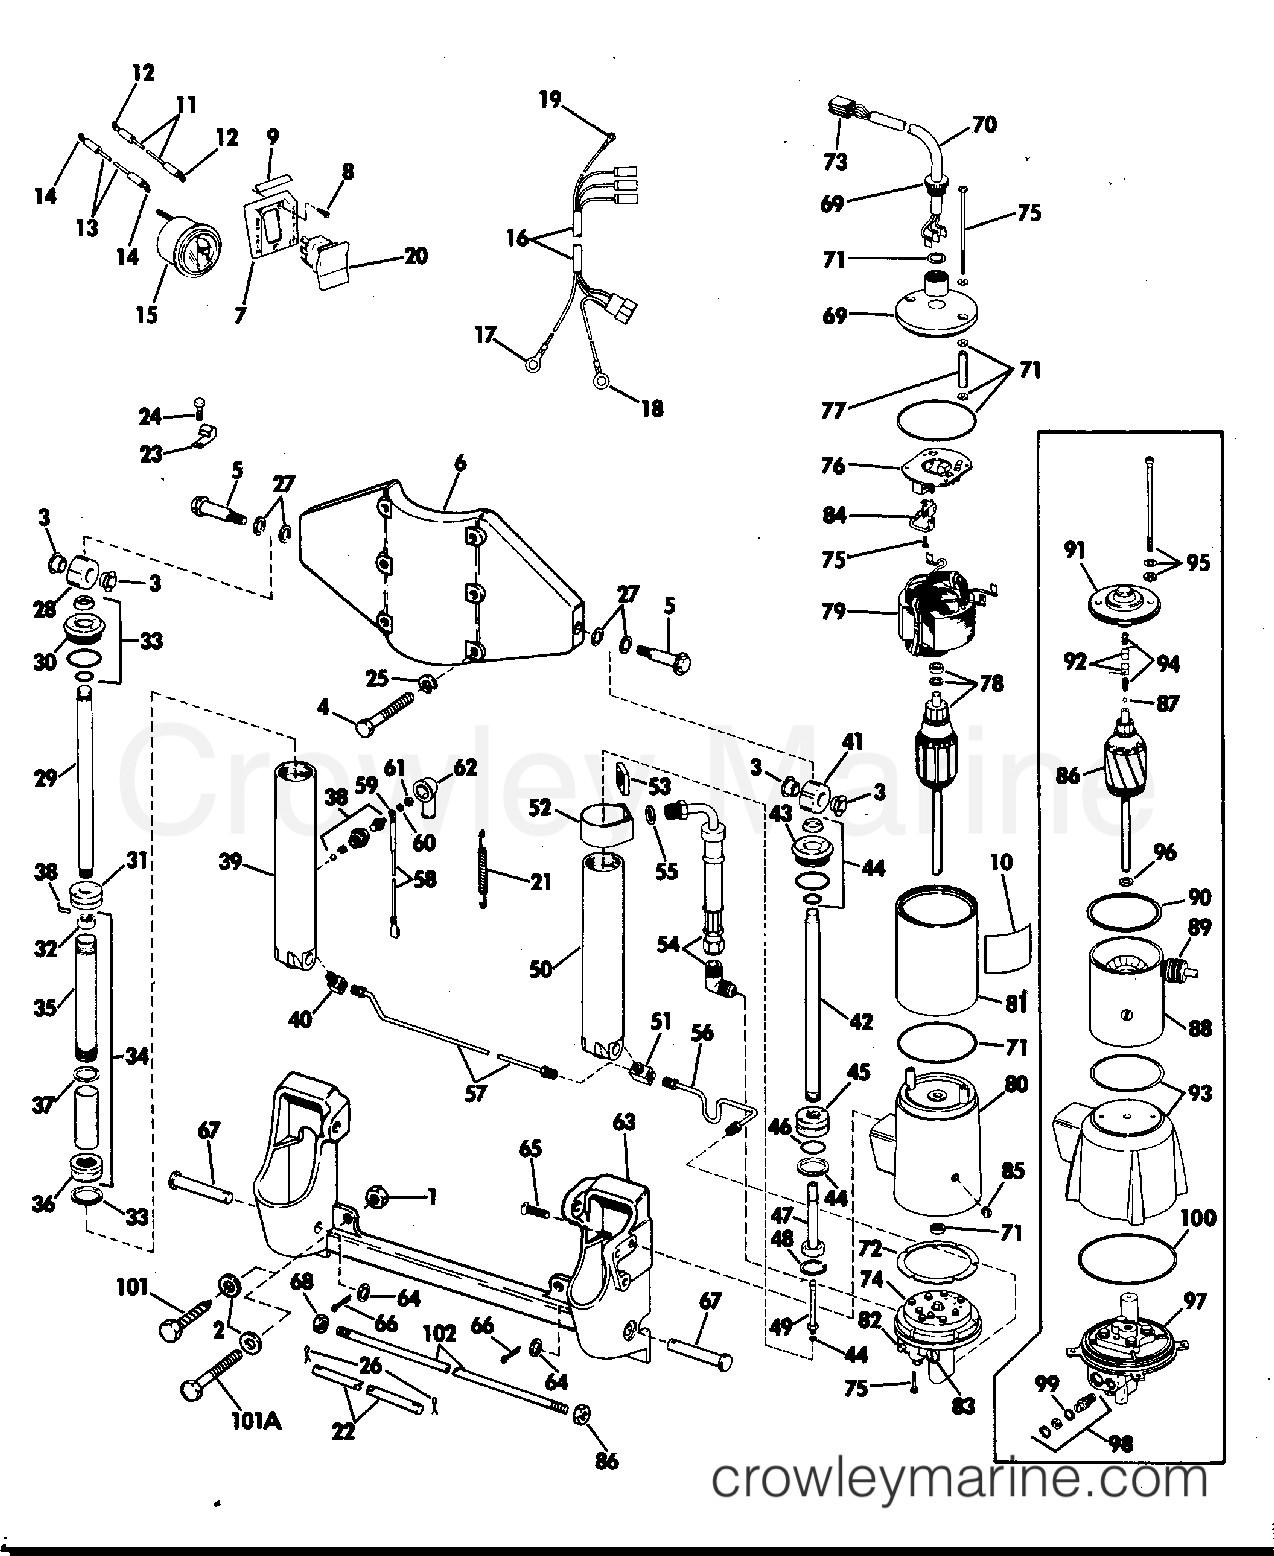 Evinrude etec Rigging guide hp Owners Manual pdf